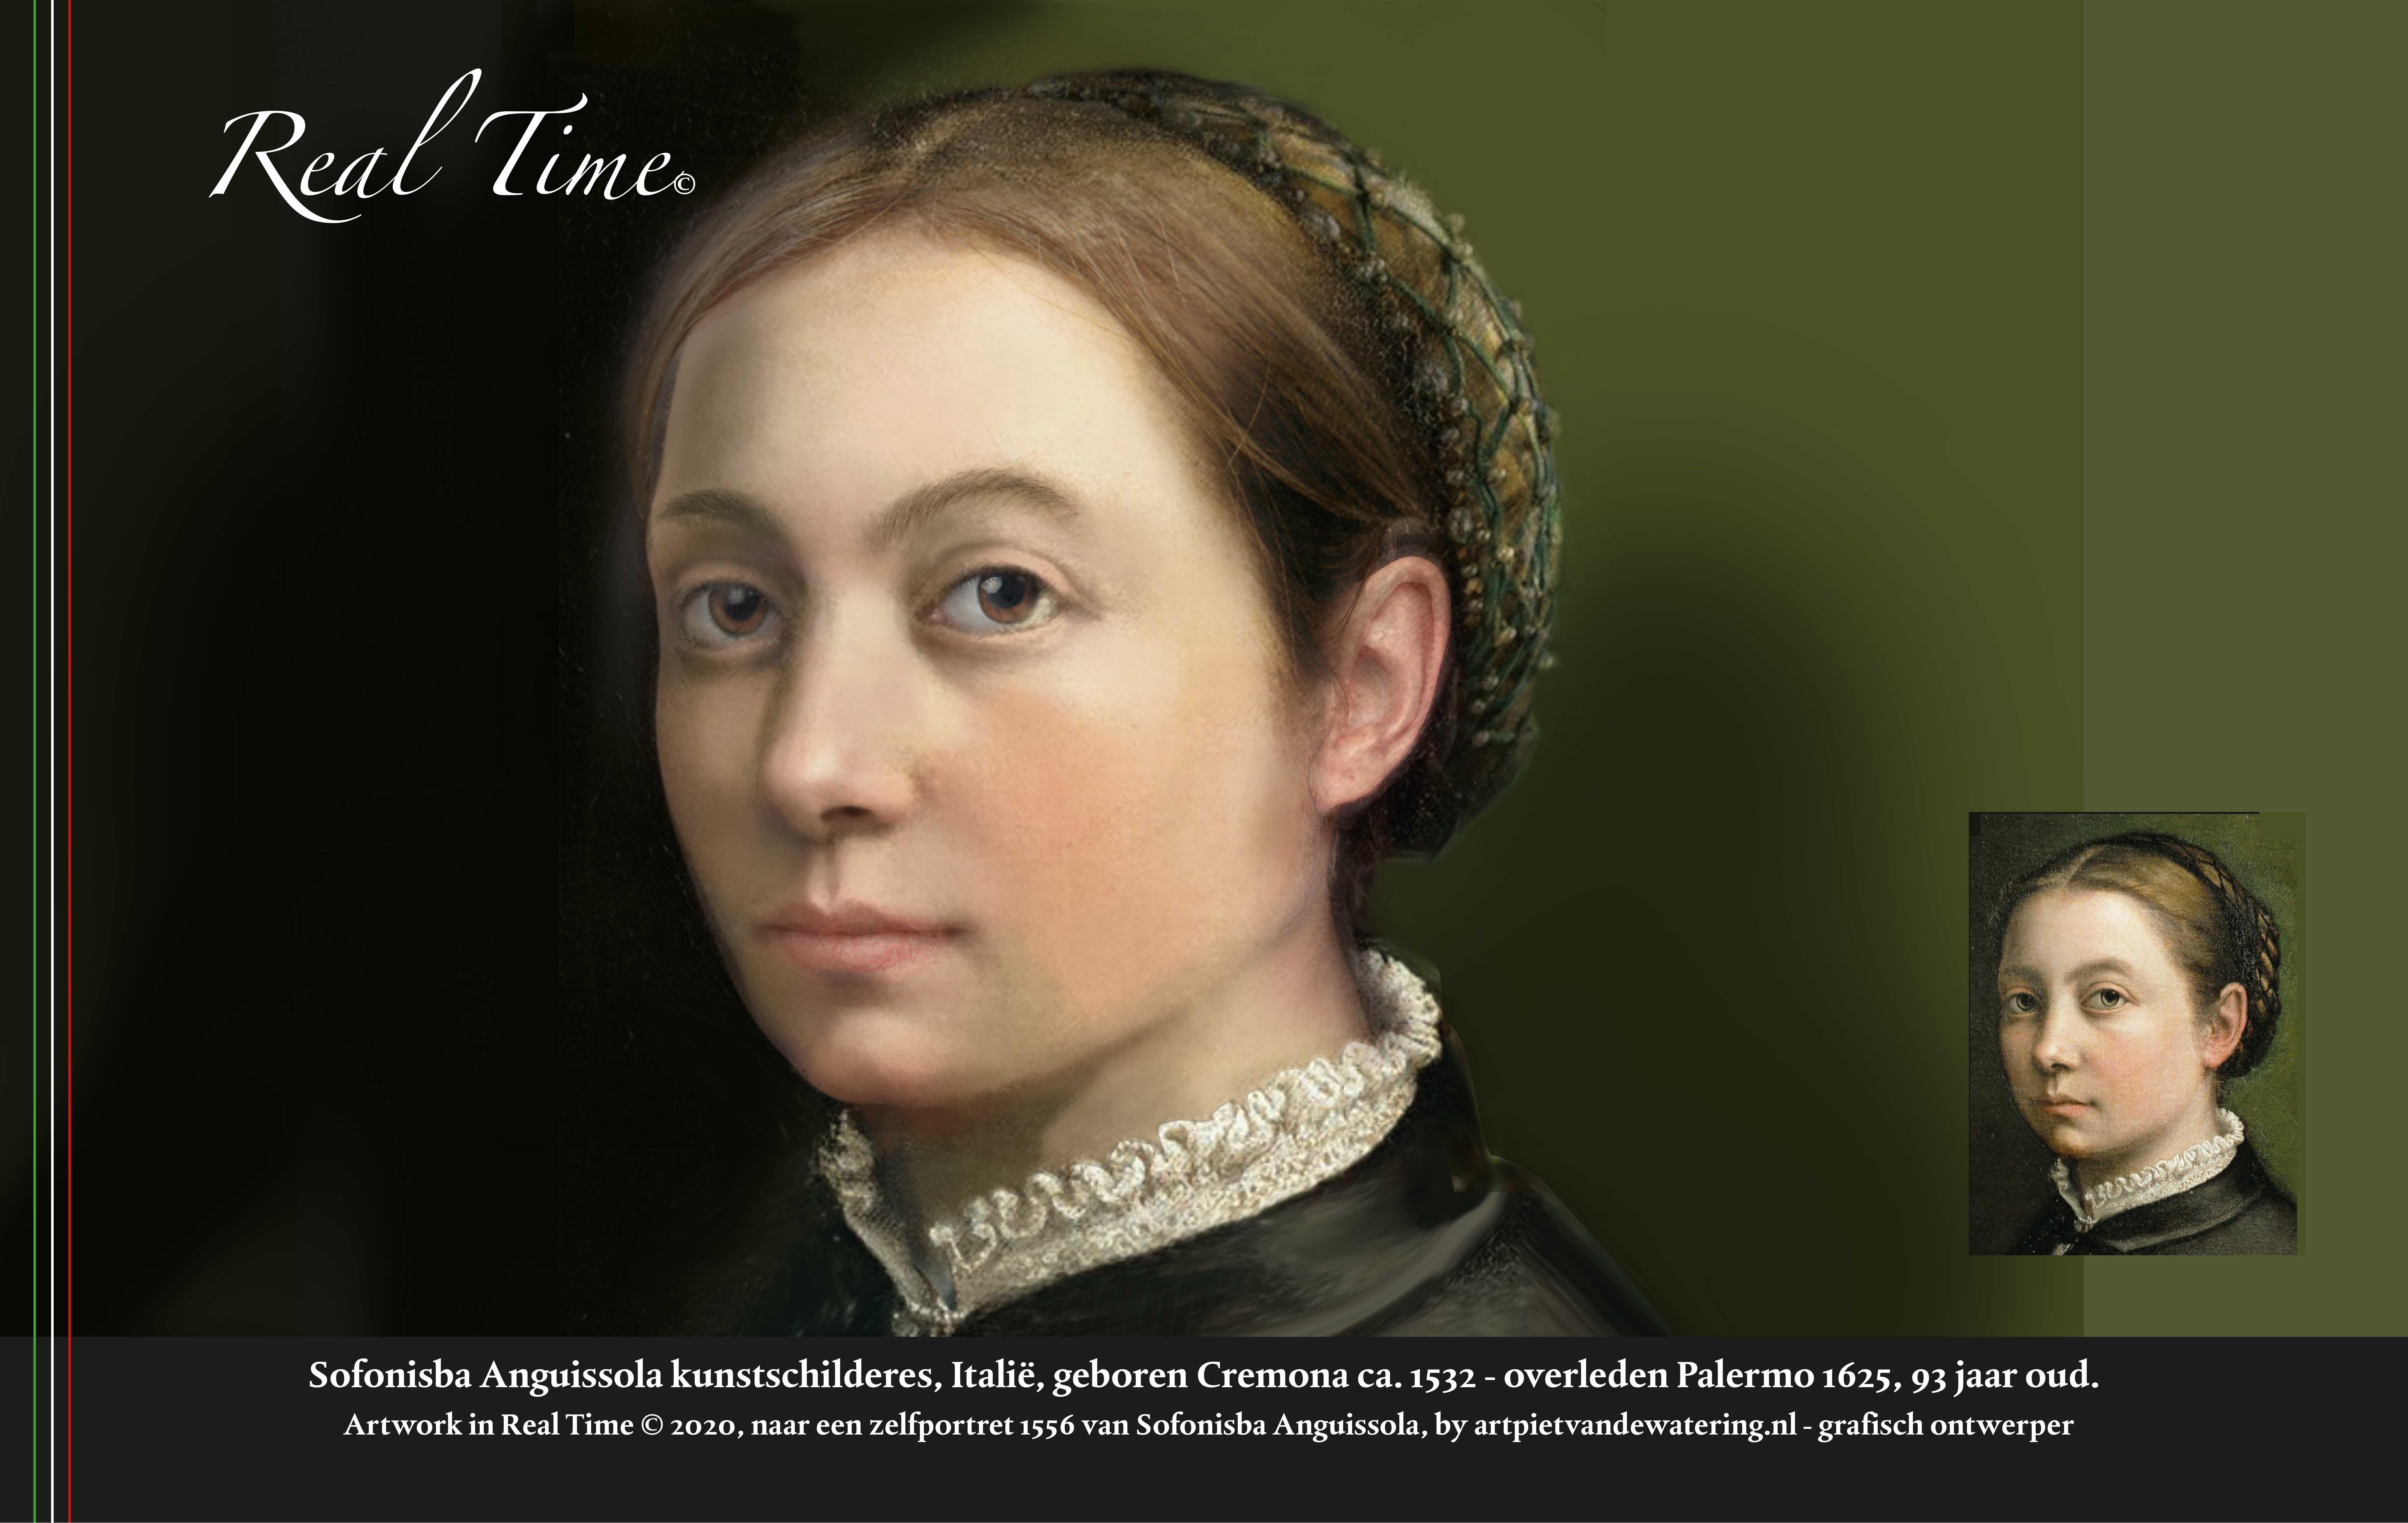 Sofonisba-Anguissola